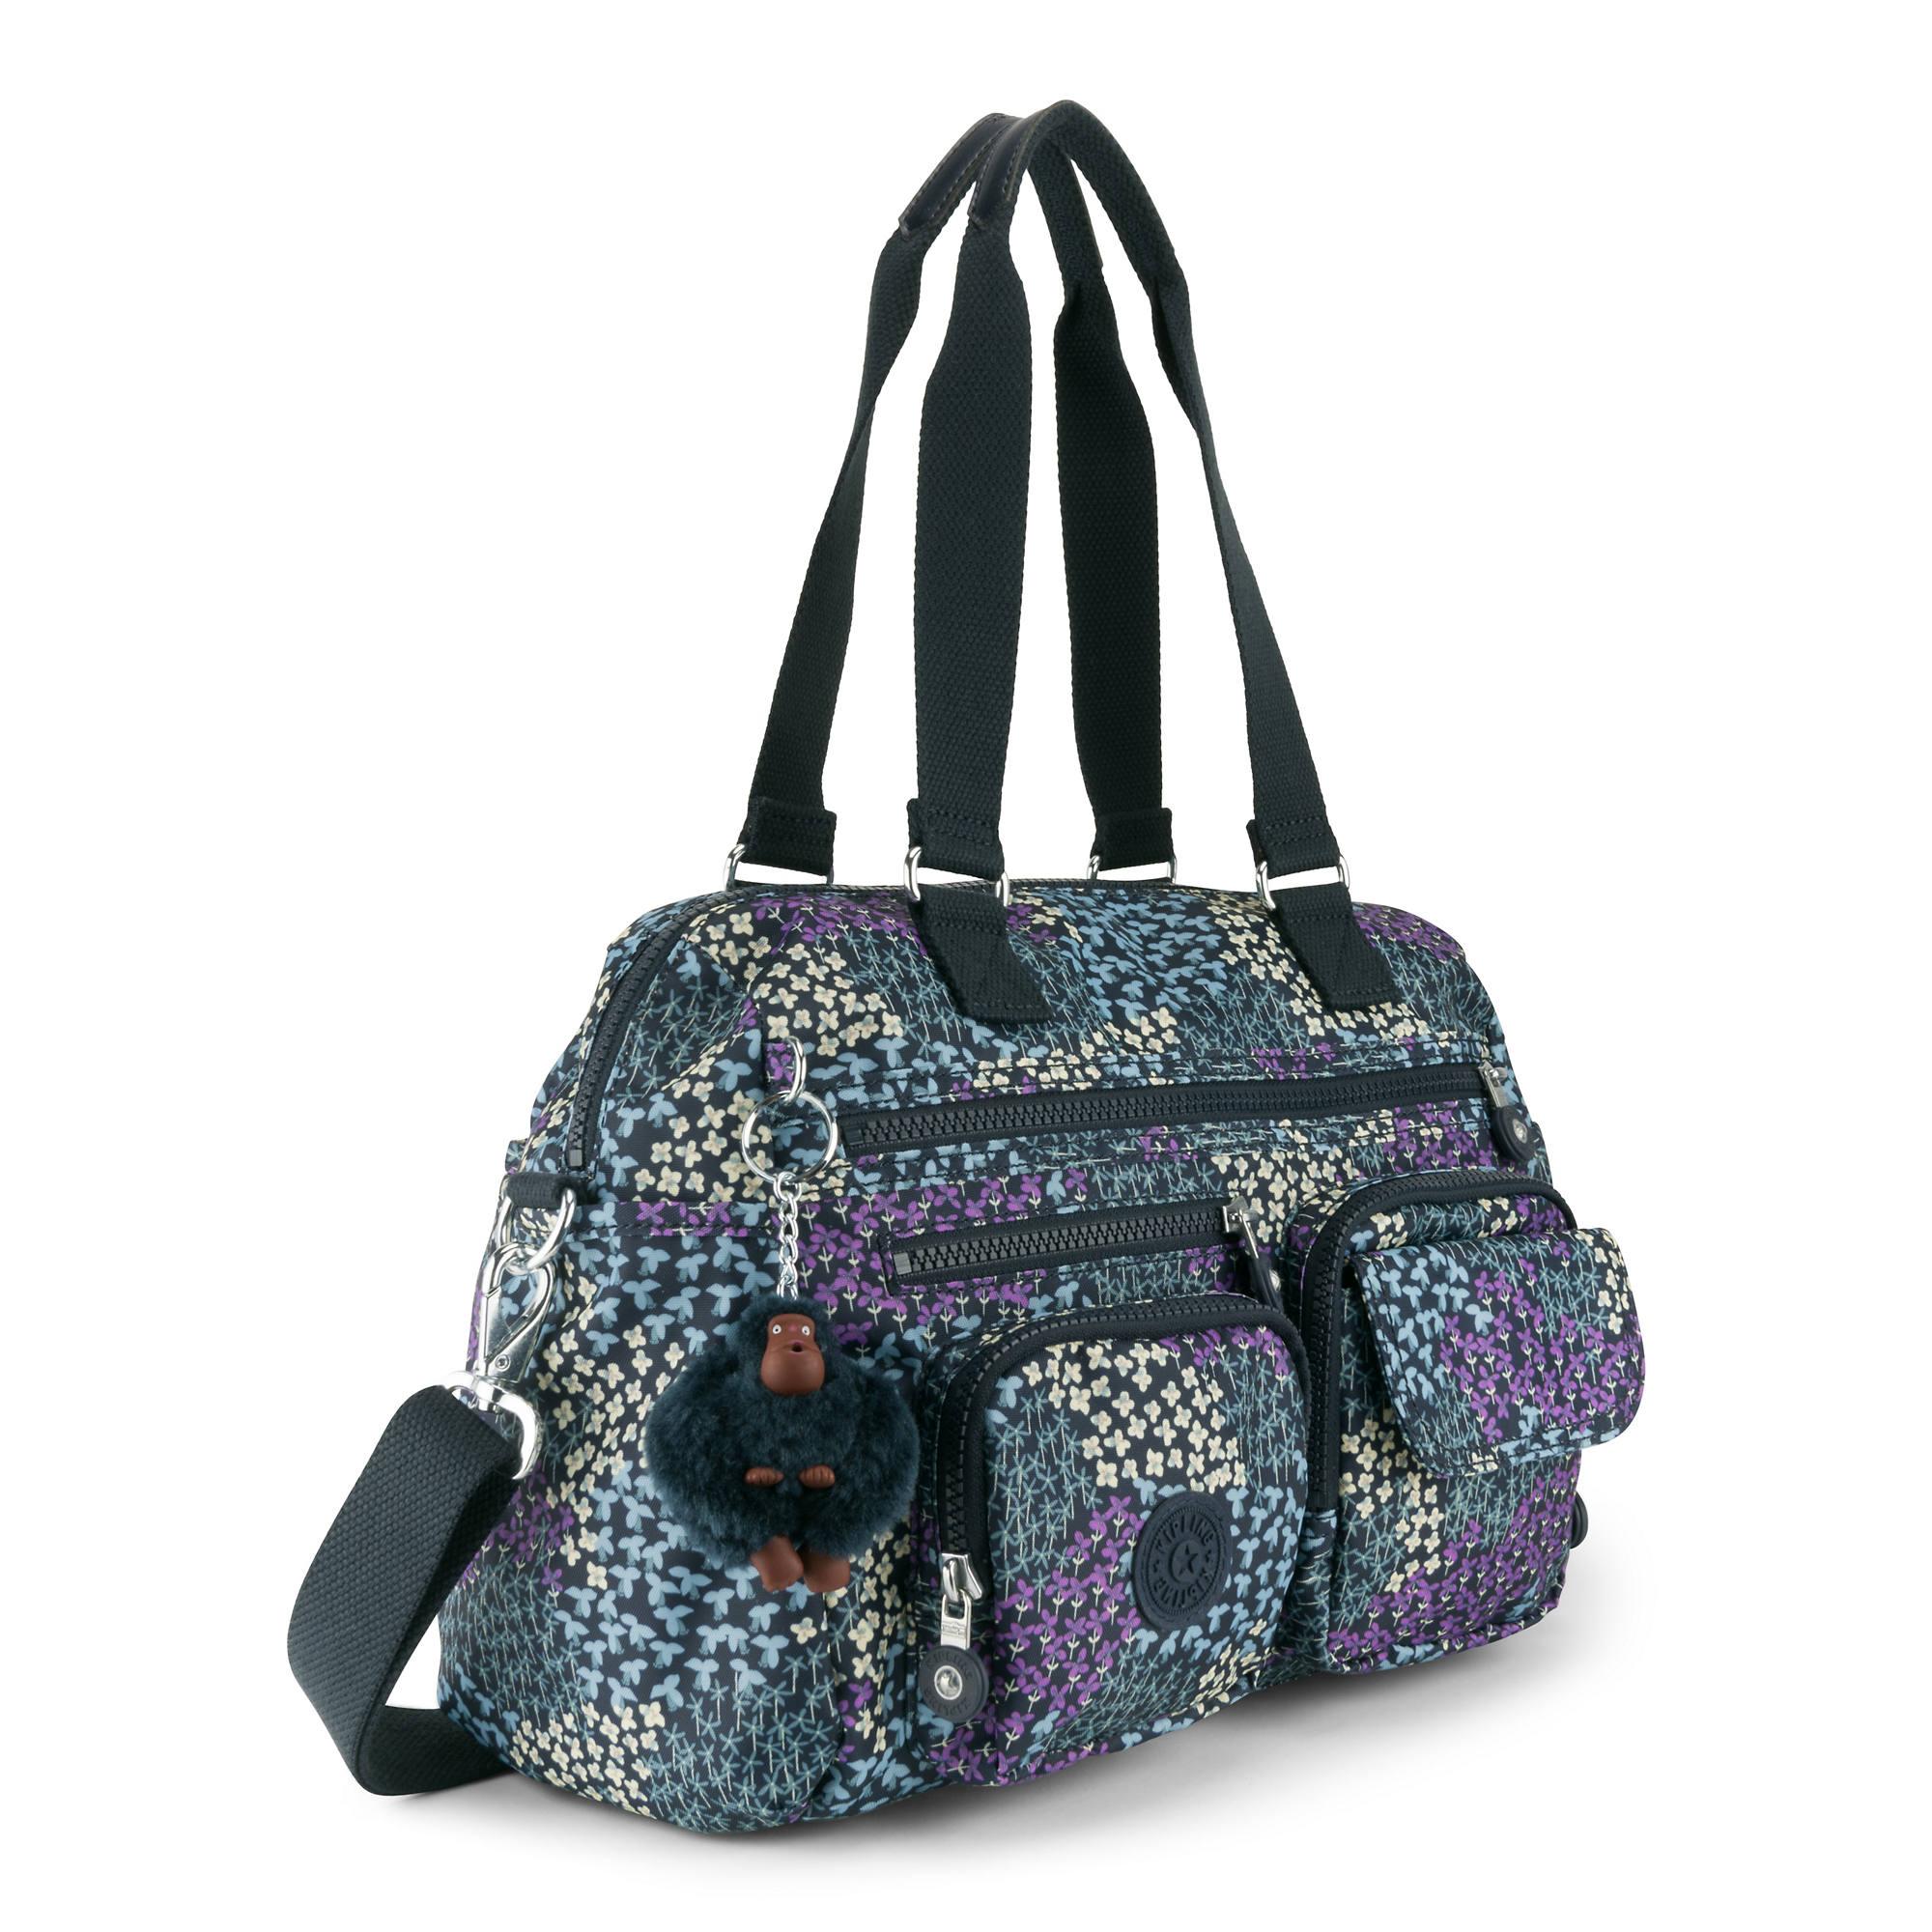 Kipling Mara Printed Handbag Ebay